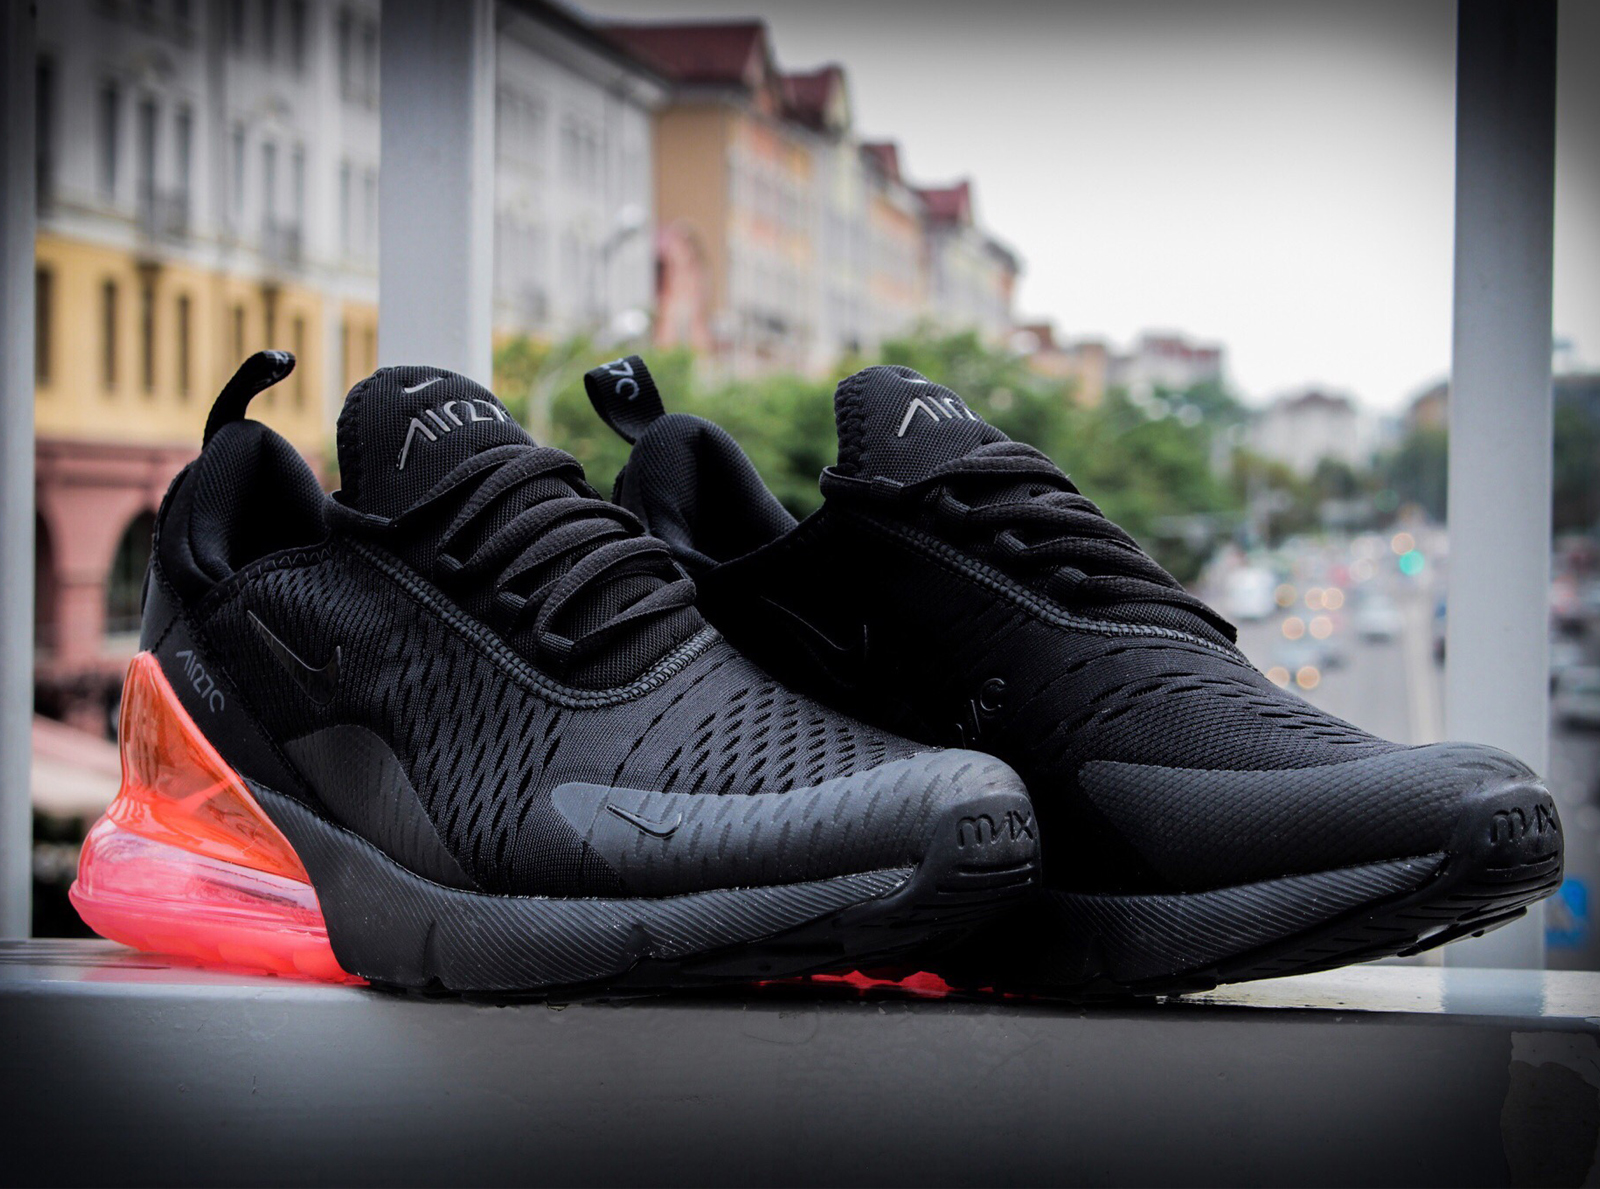 Nike Air Max 270 Triple Black Hot Punch - магазин